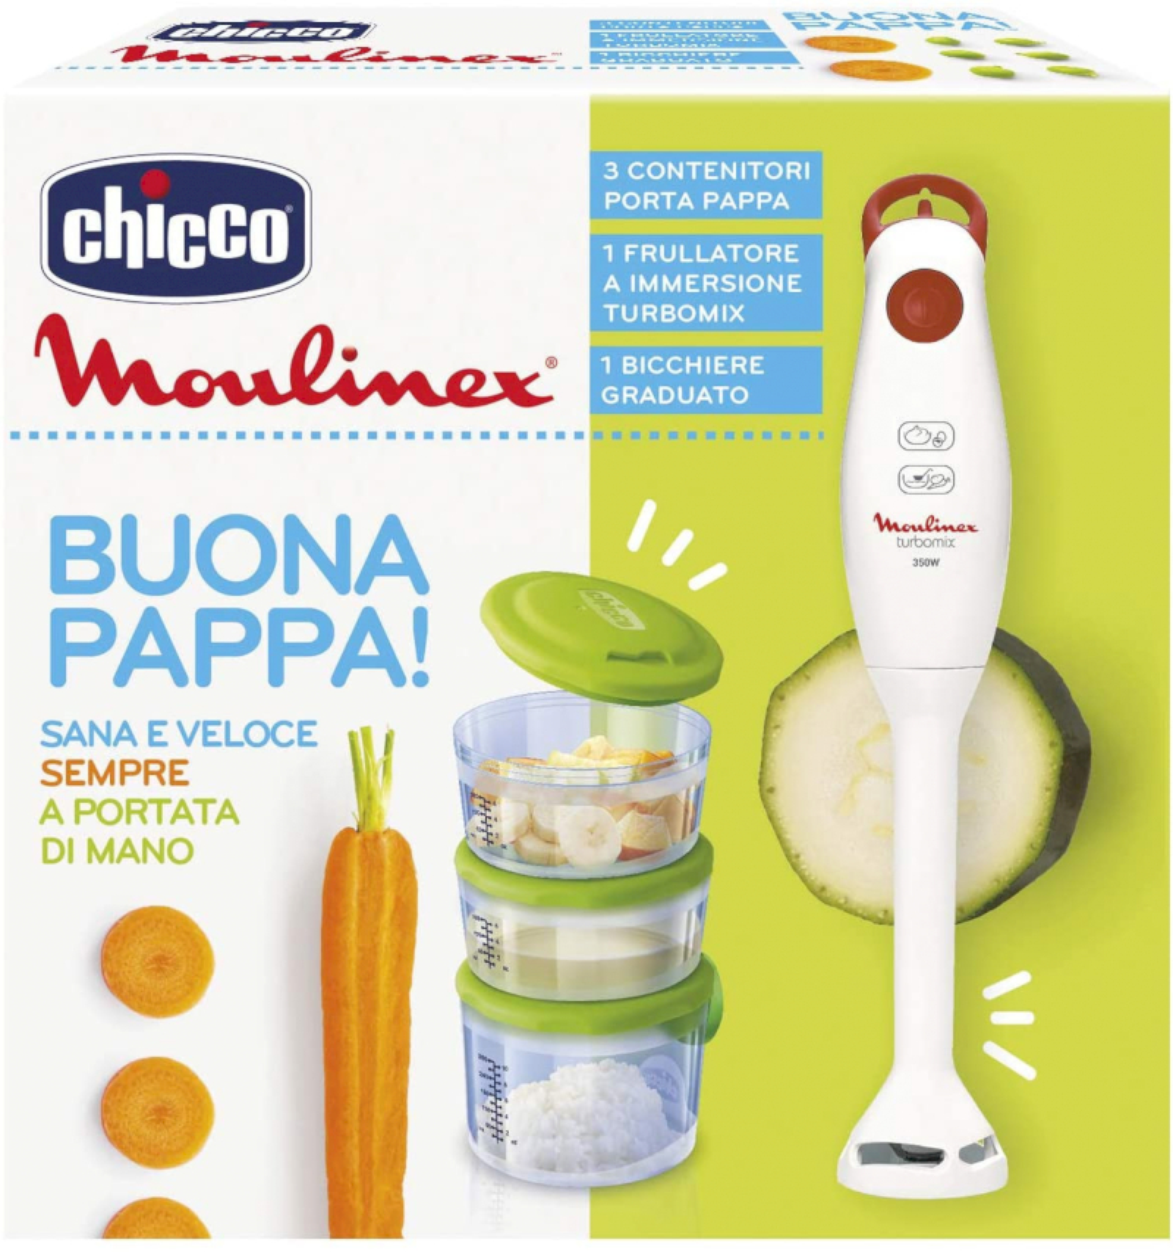 Chicco & Moulinex Buona Pappa